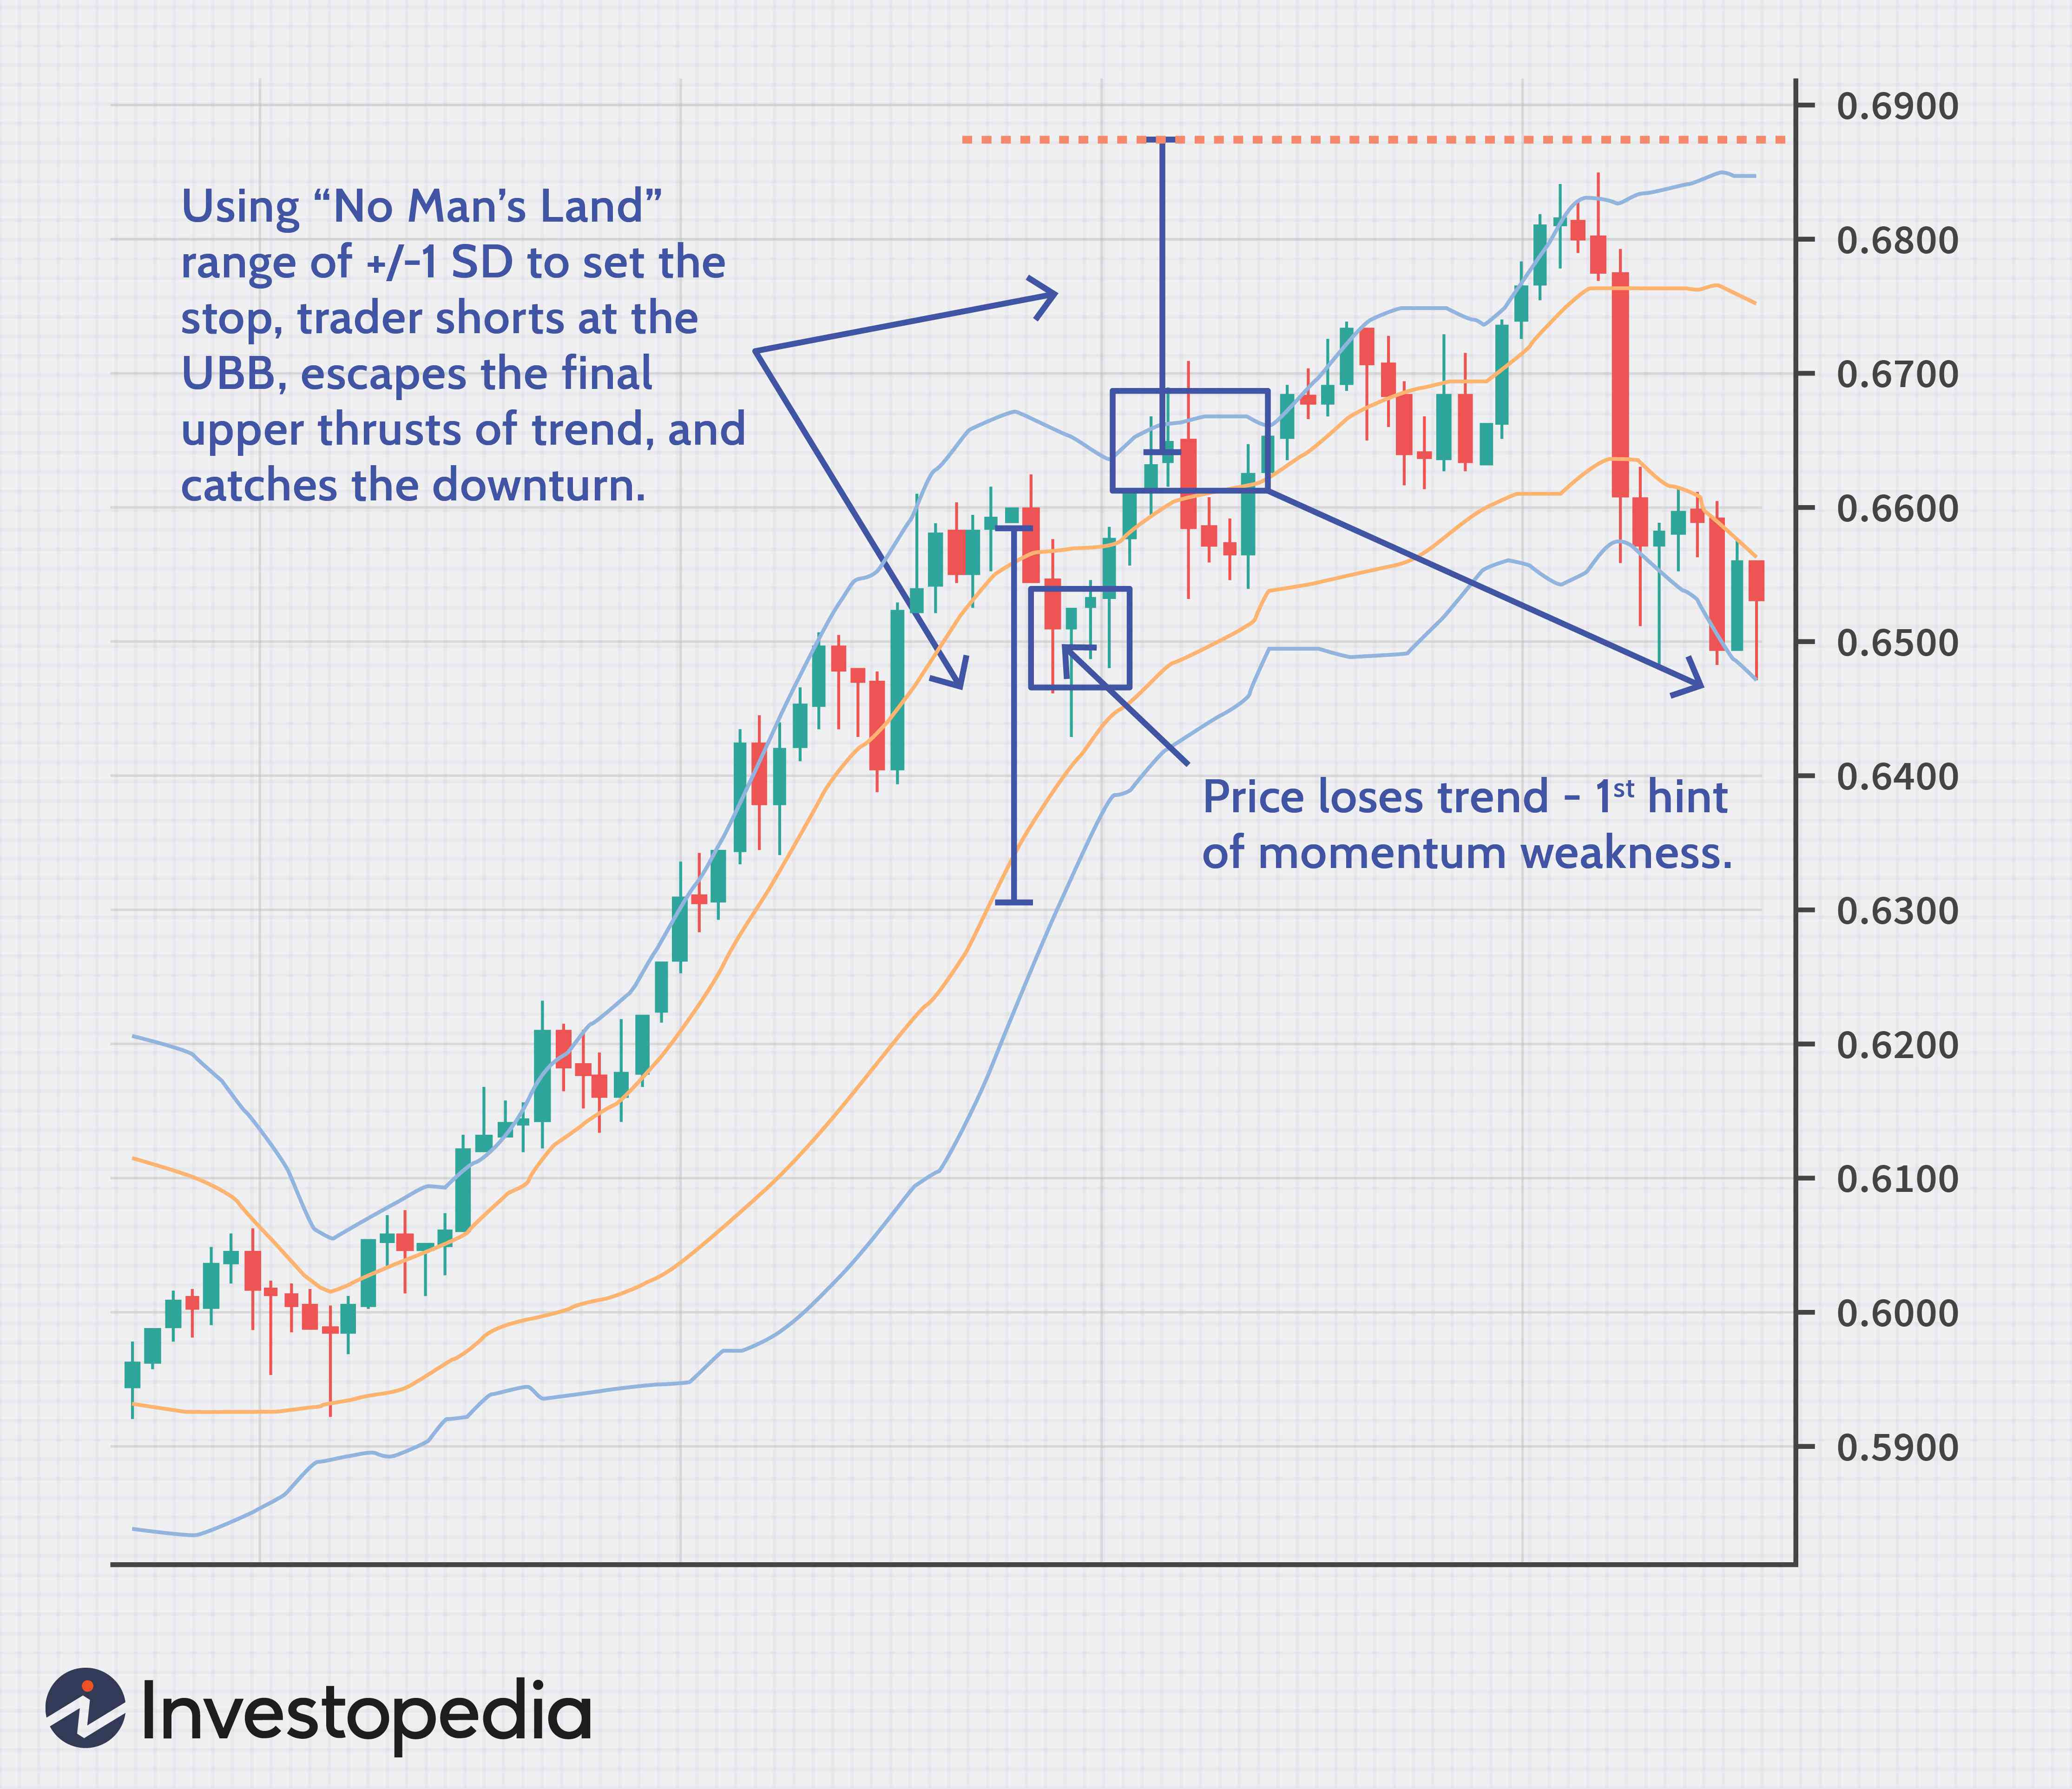 Bollinger bands investopedia forex two harbors investment reit